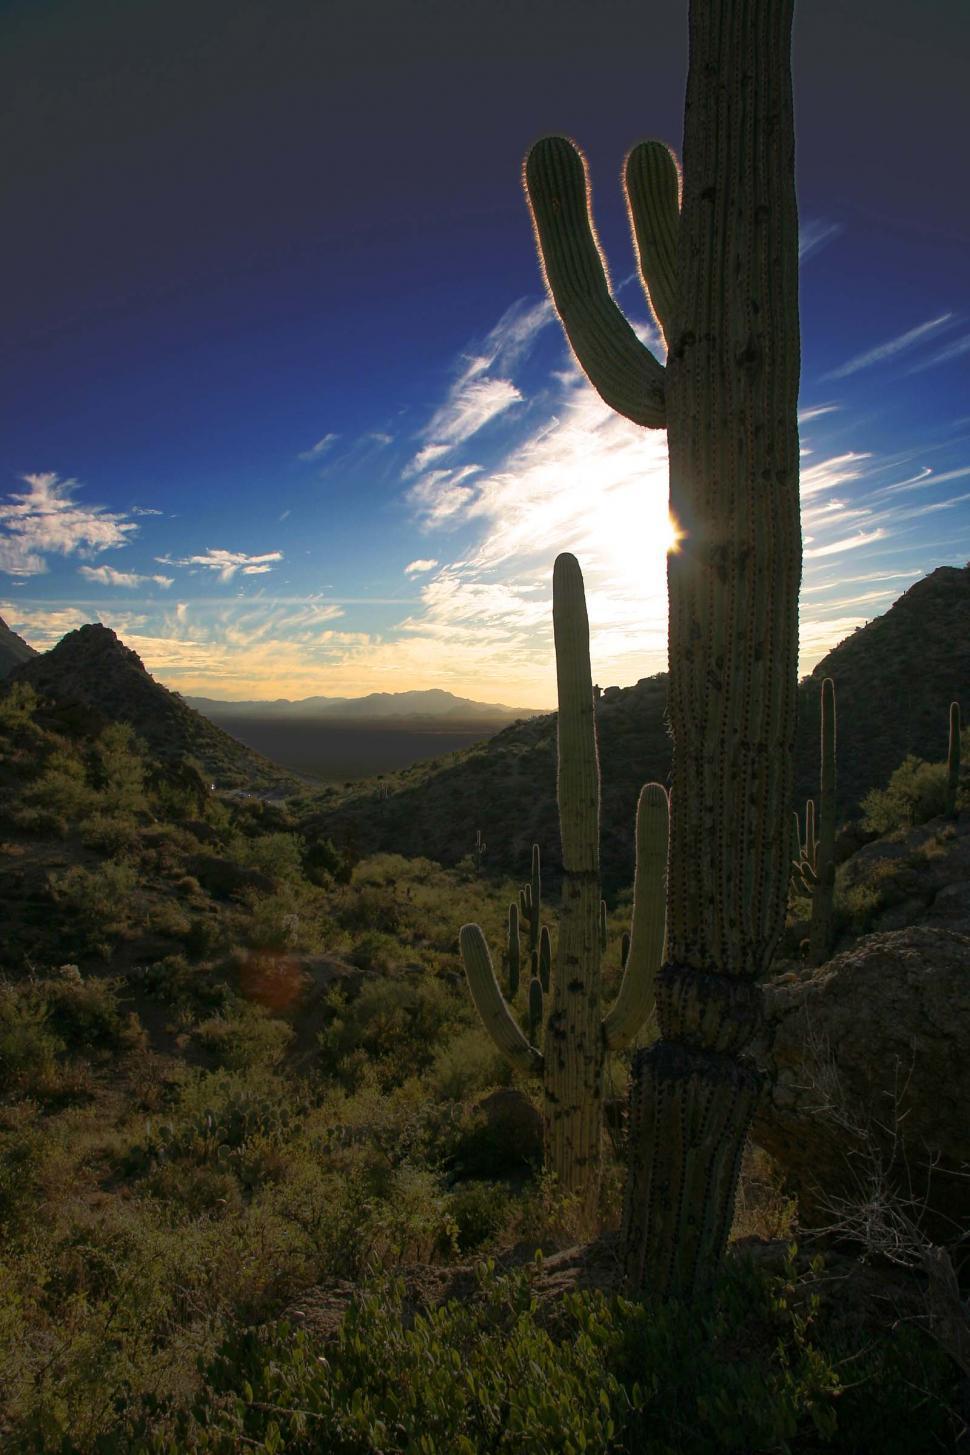 Download Free Stock Photo of Desert mountain pass at sunset